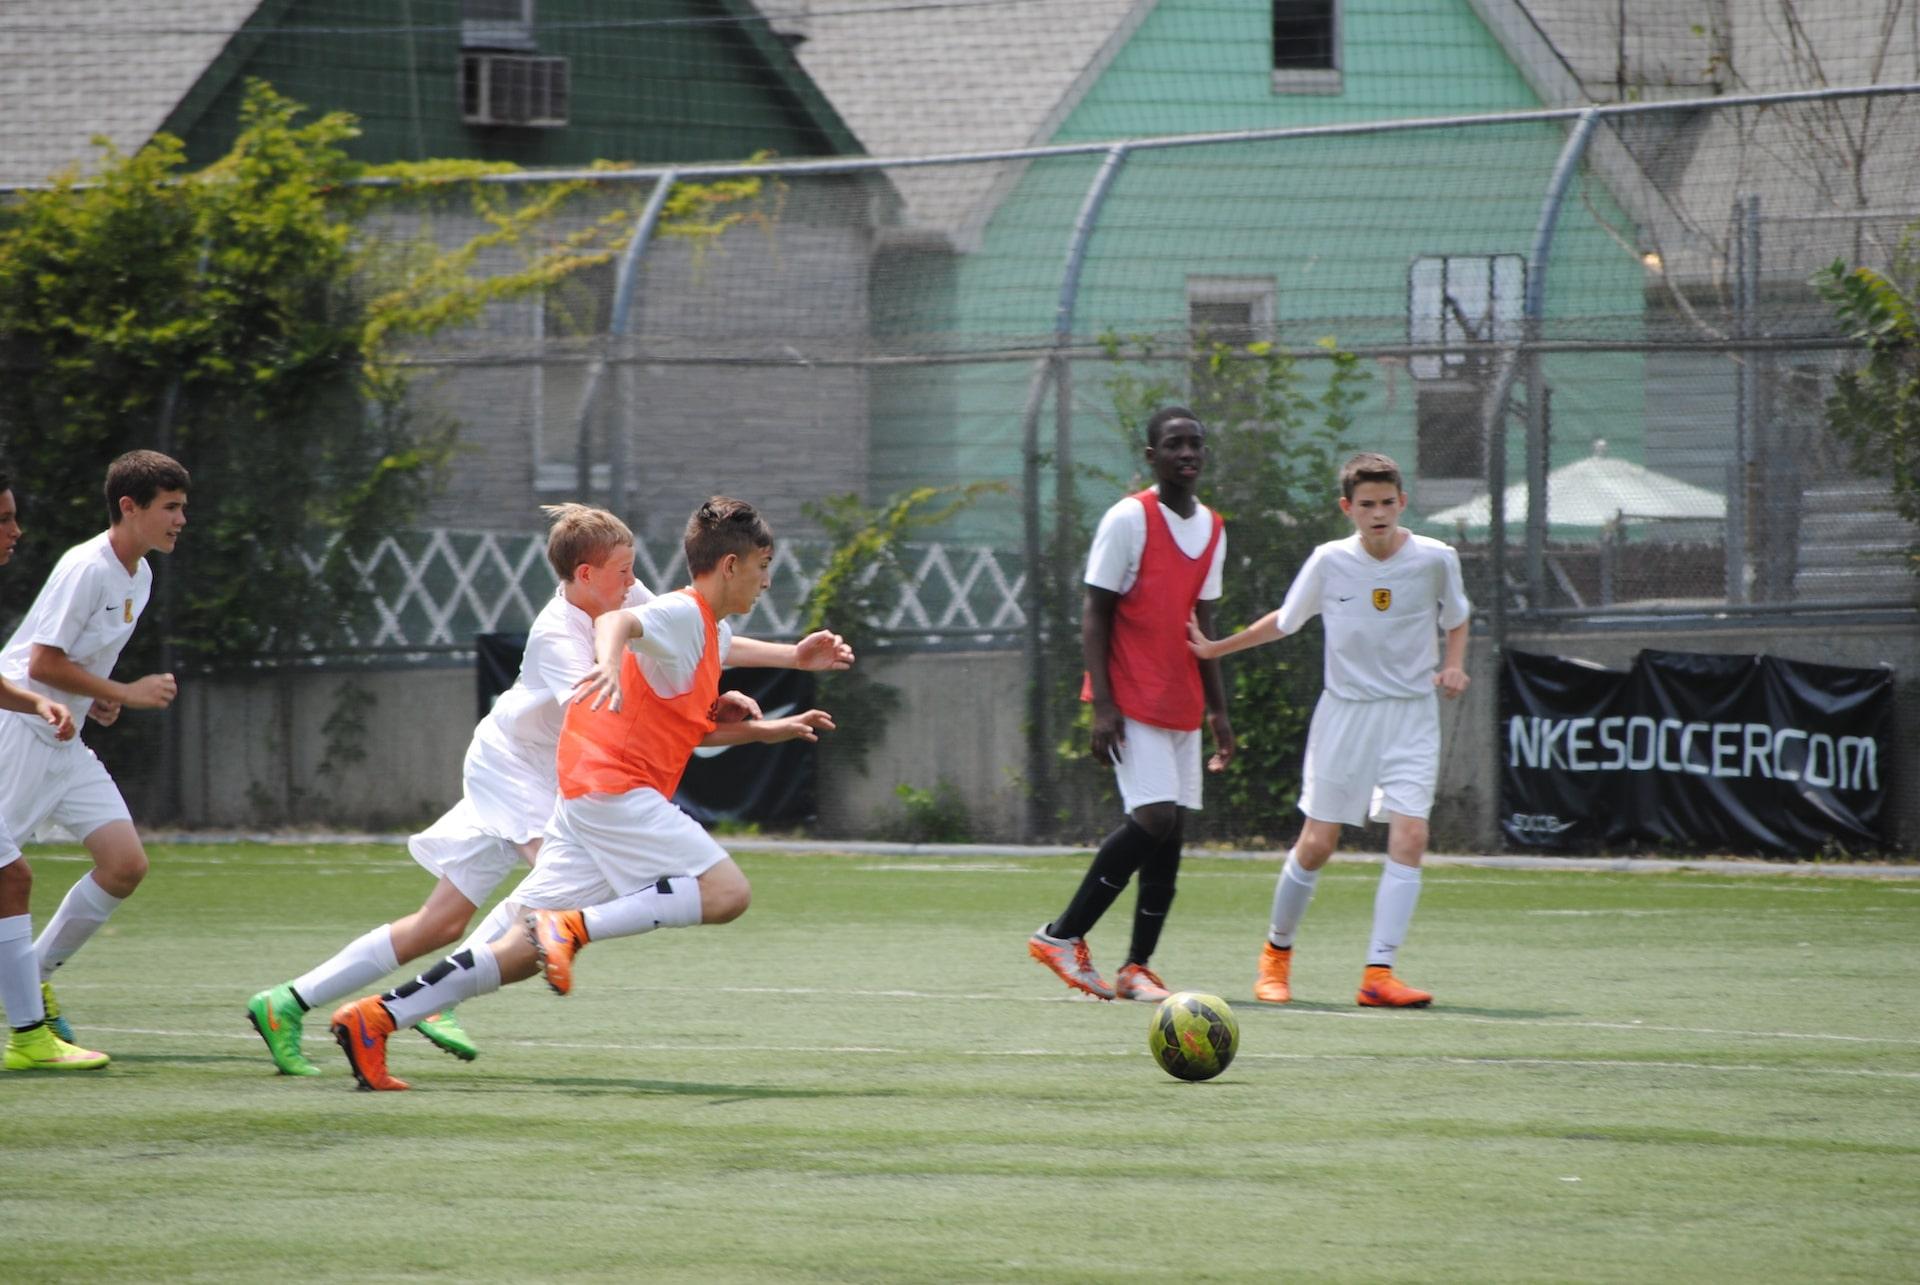 Premier Youth Soccer Clubs Capital Region